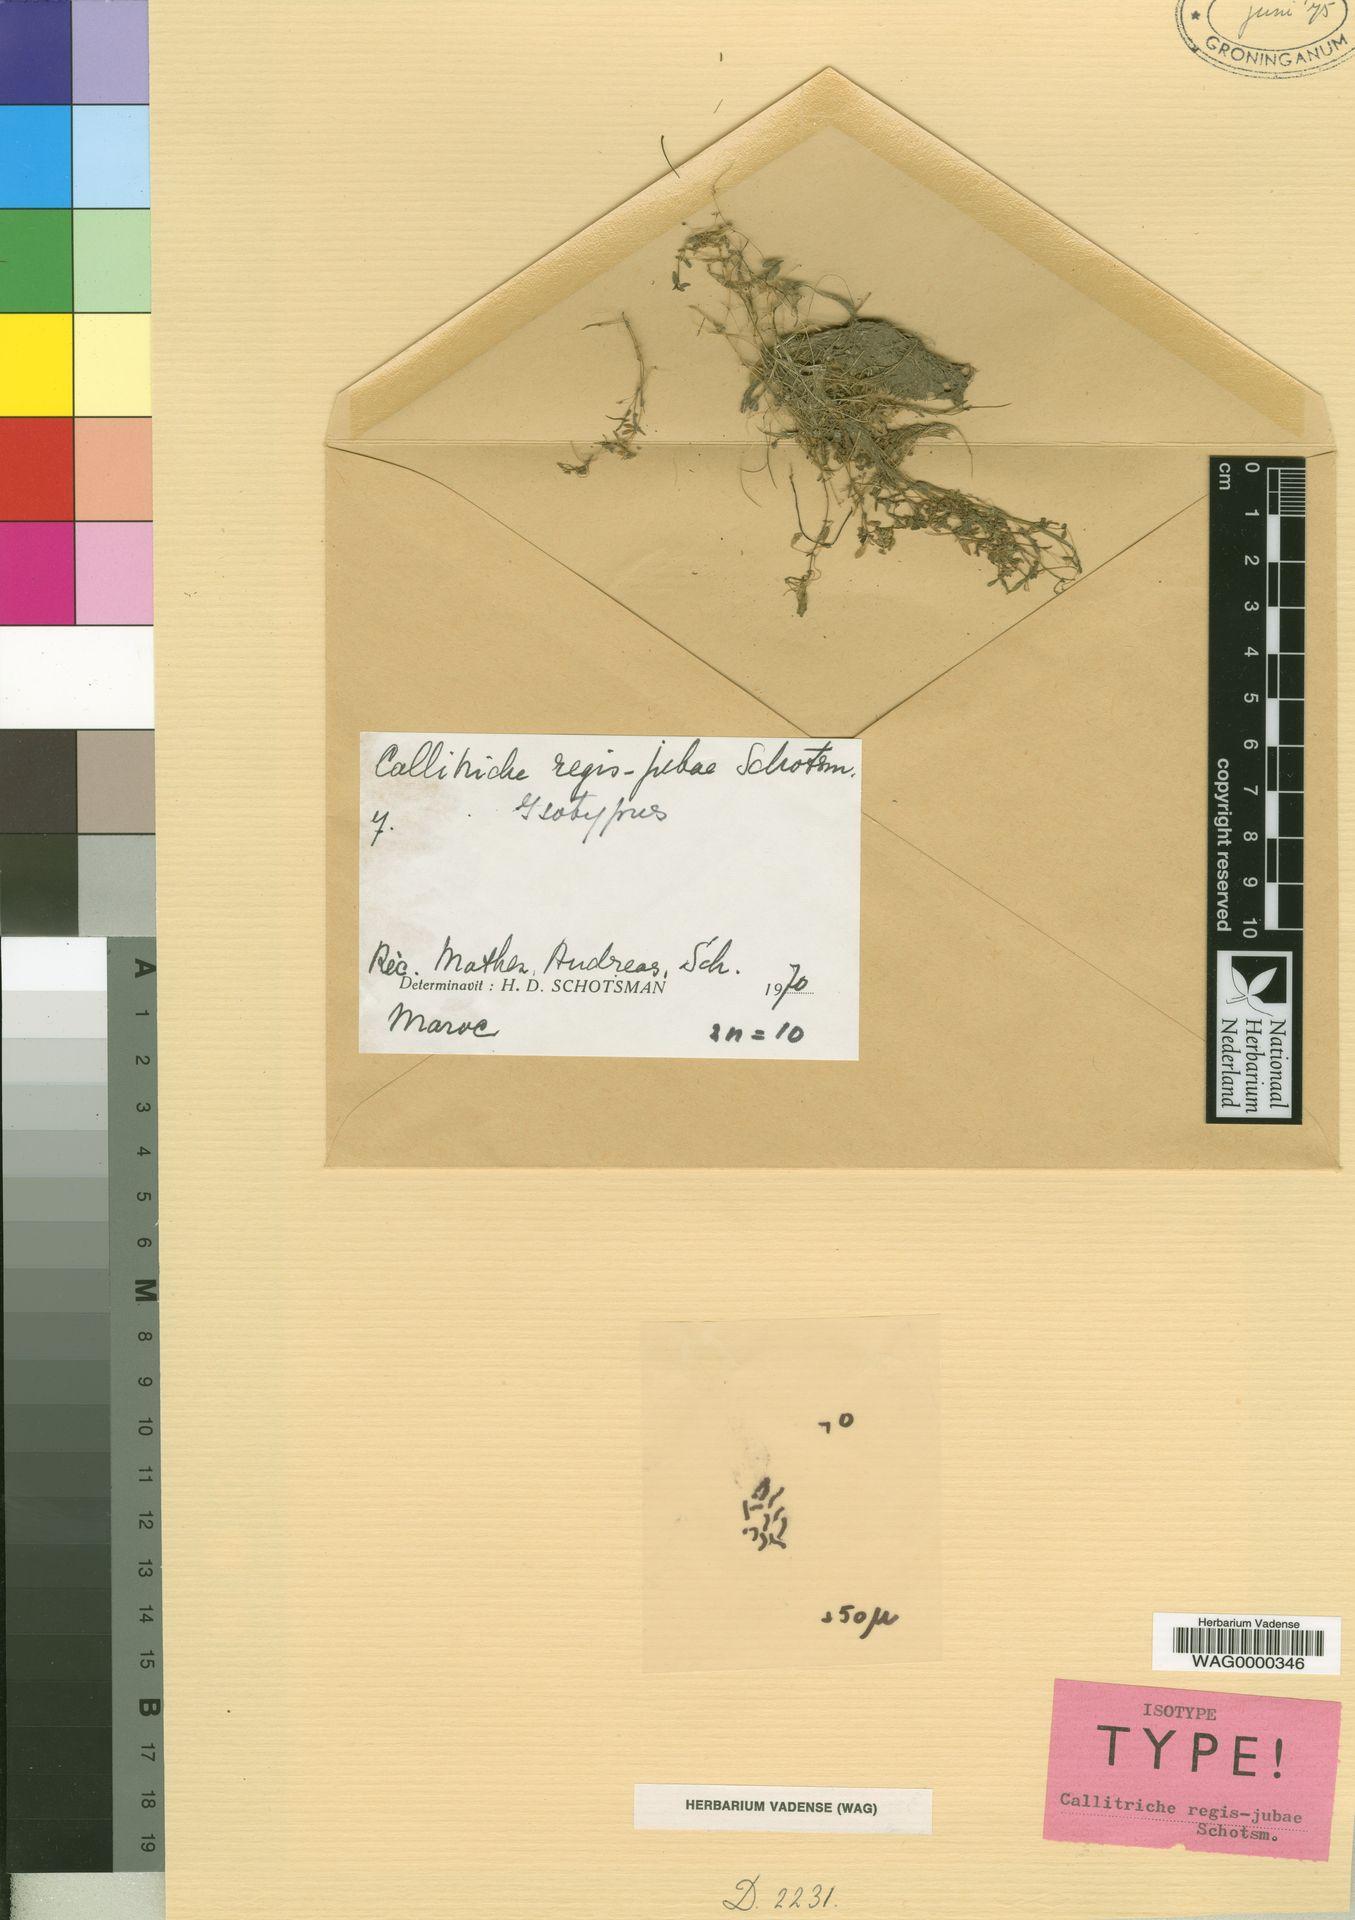 WAG0000346 | Callitriche regis-jubae Schotsman